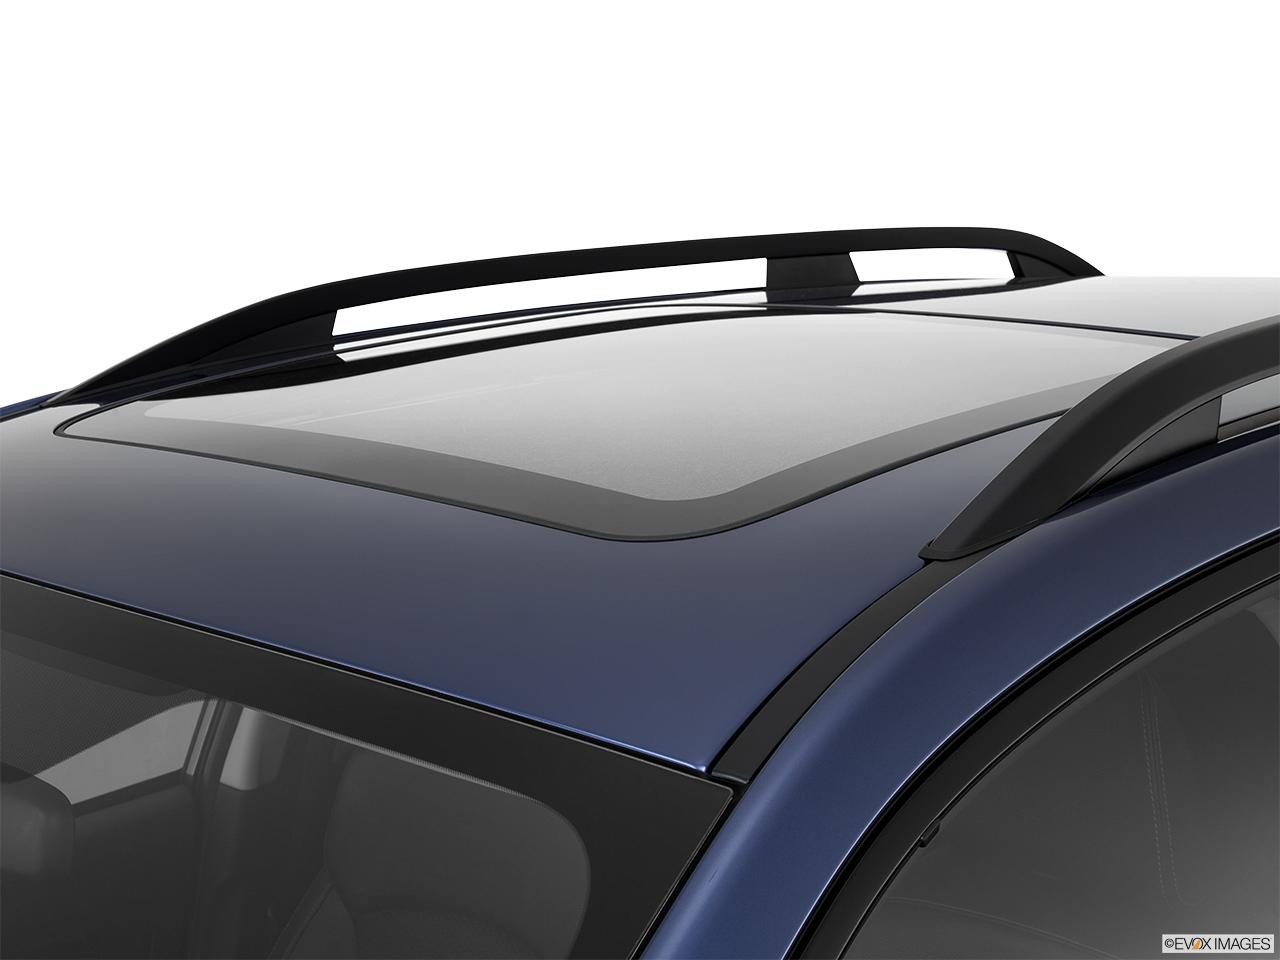 2015 Subaru Forester Automatic 2.0XT Premium - Sunroof/moonroof Cars